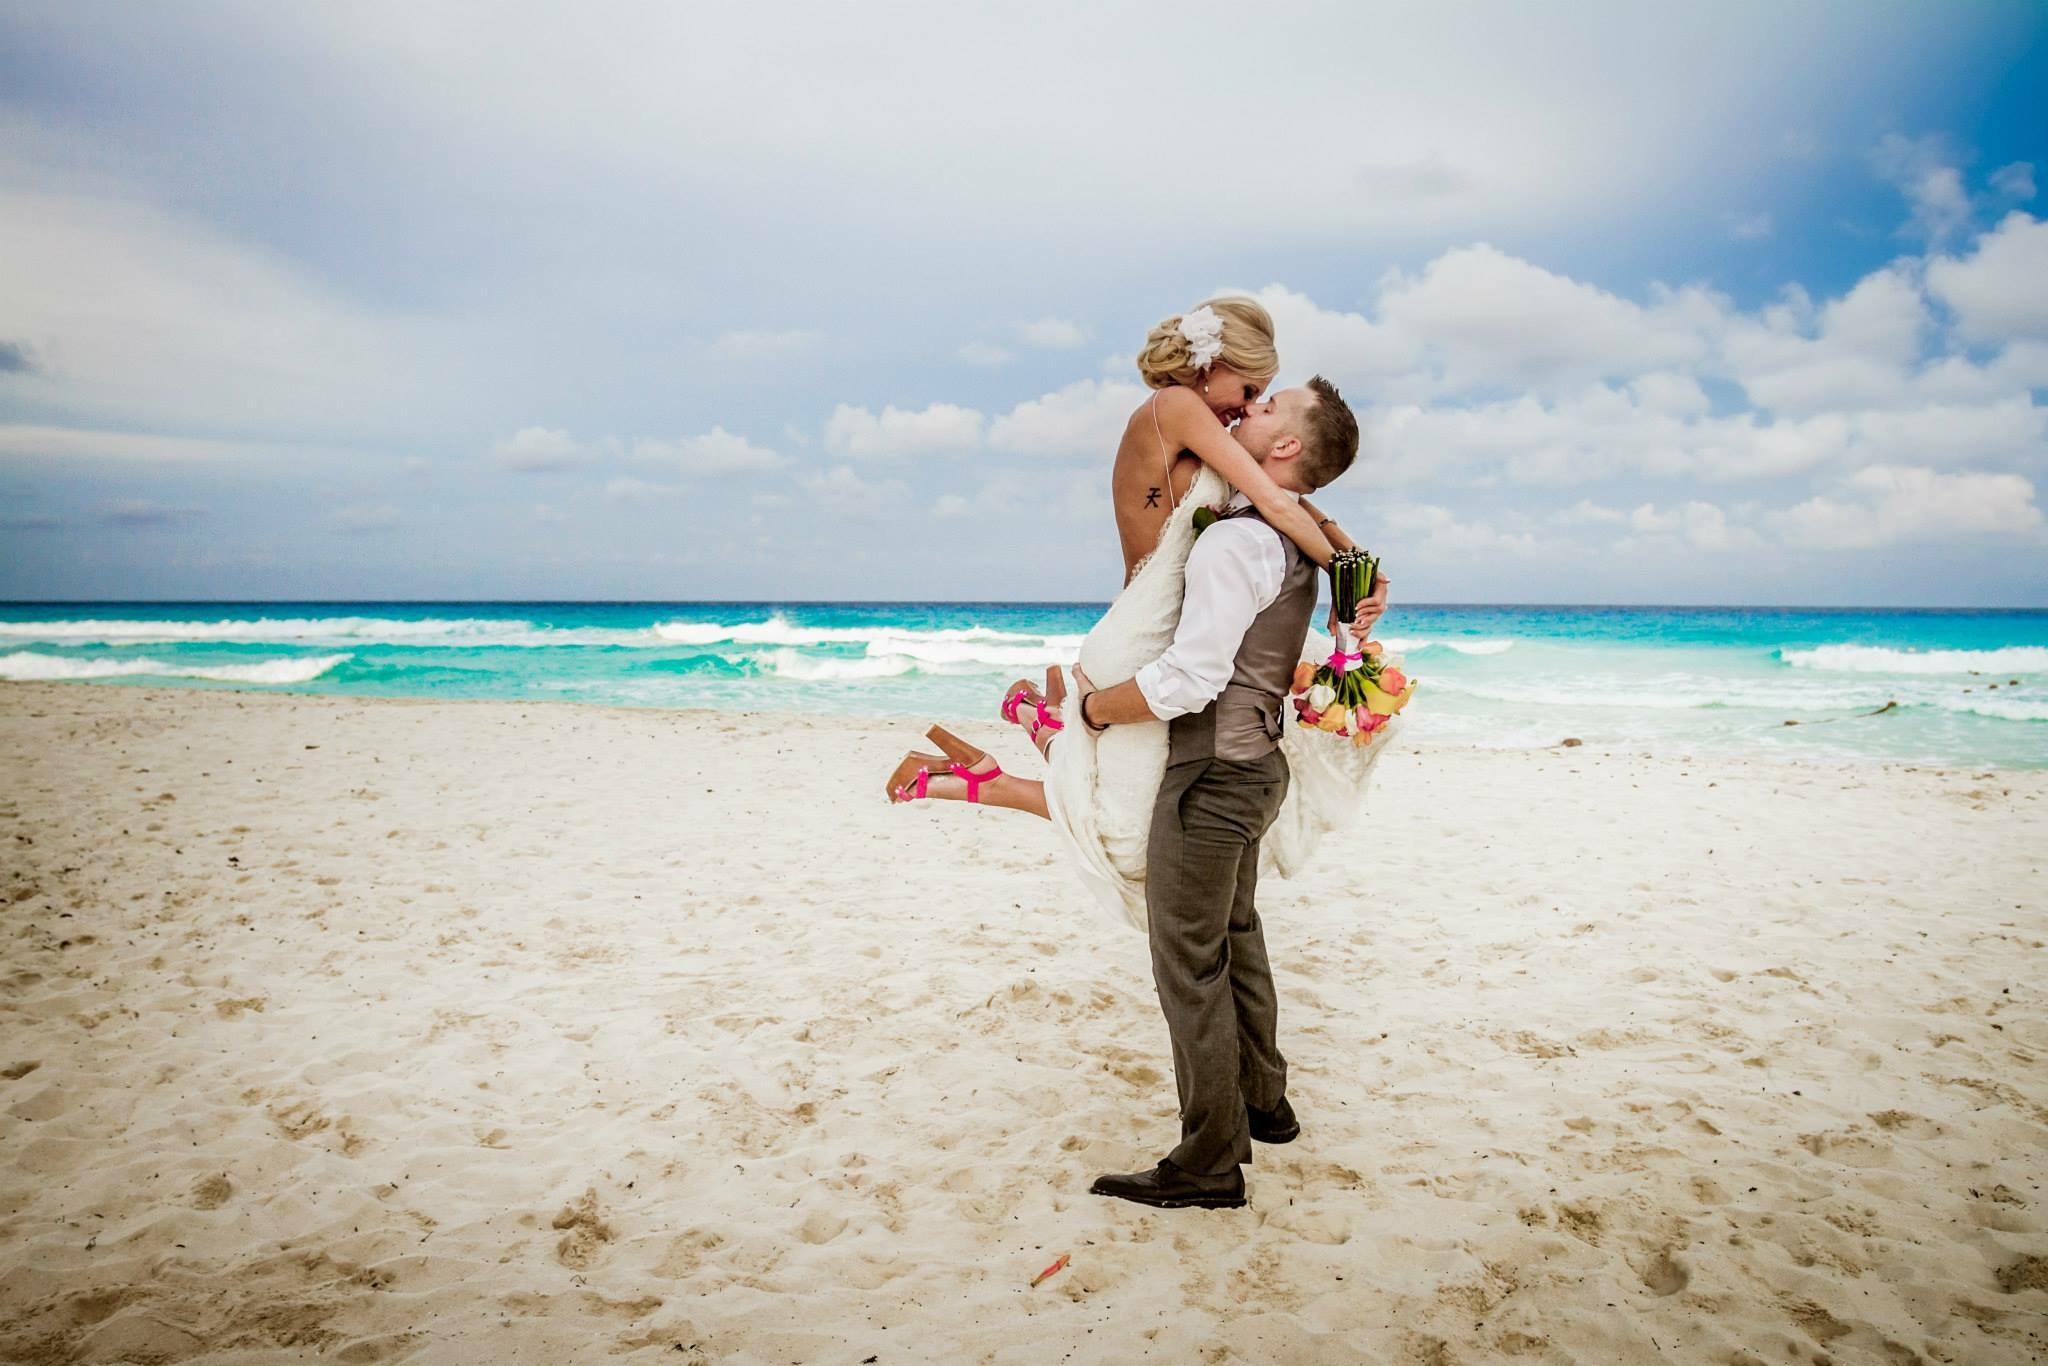 krysten-reed-cancun-beach-wedding-23.JPG